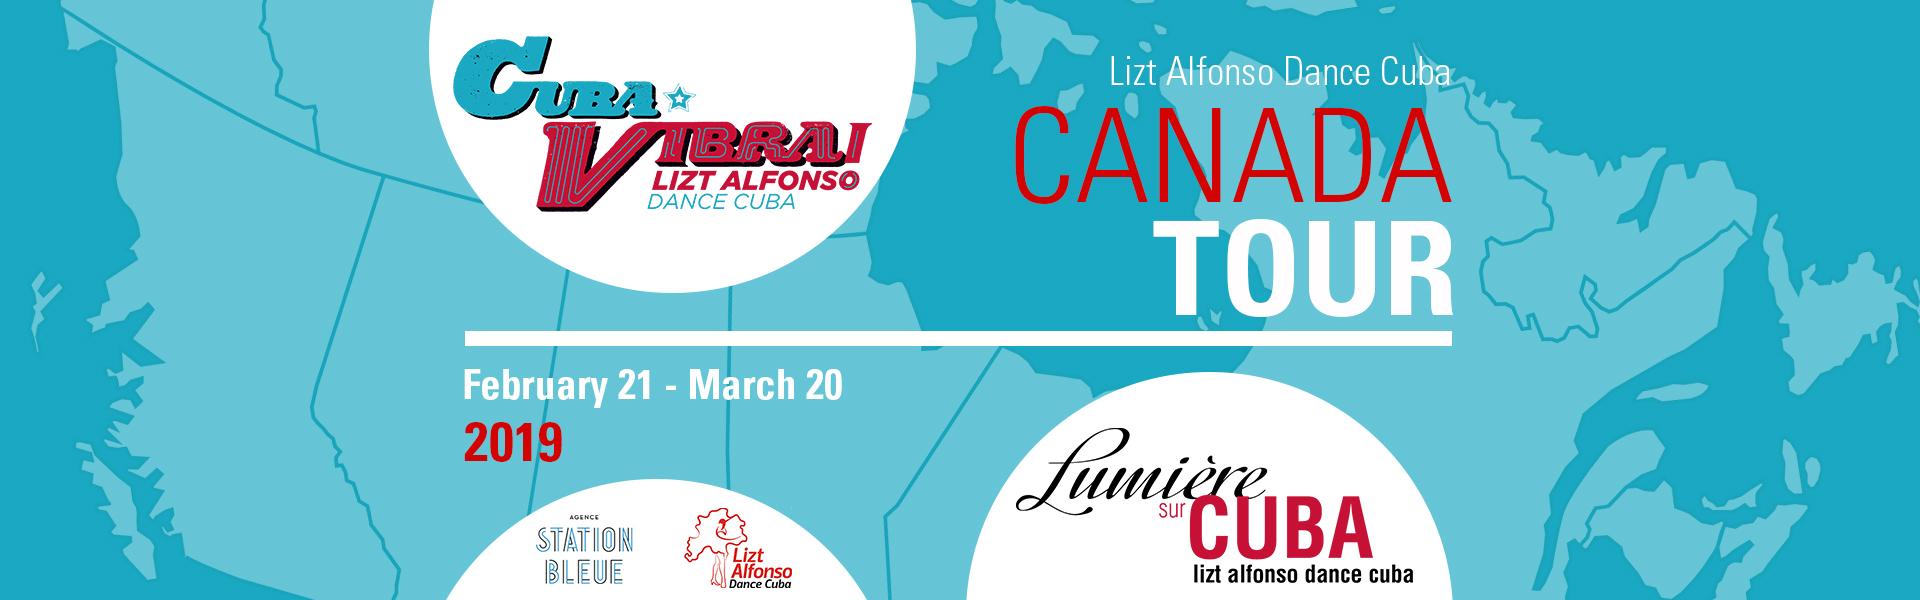 Canada tour 2019 Lizt Alfonso Dance Cuba